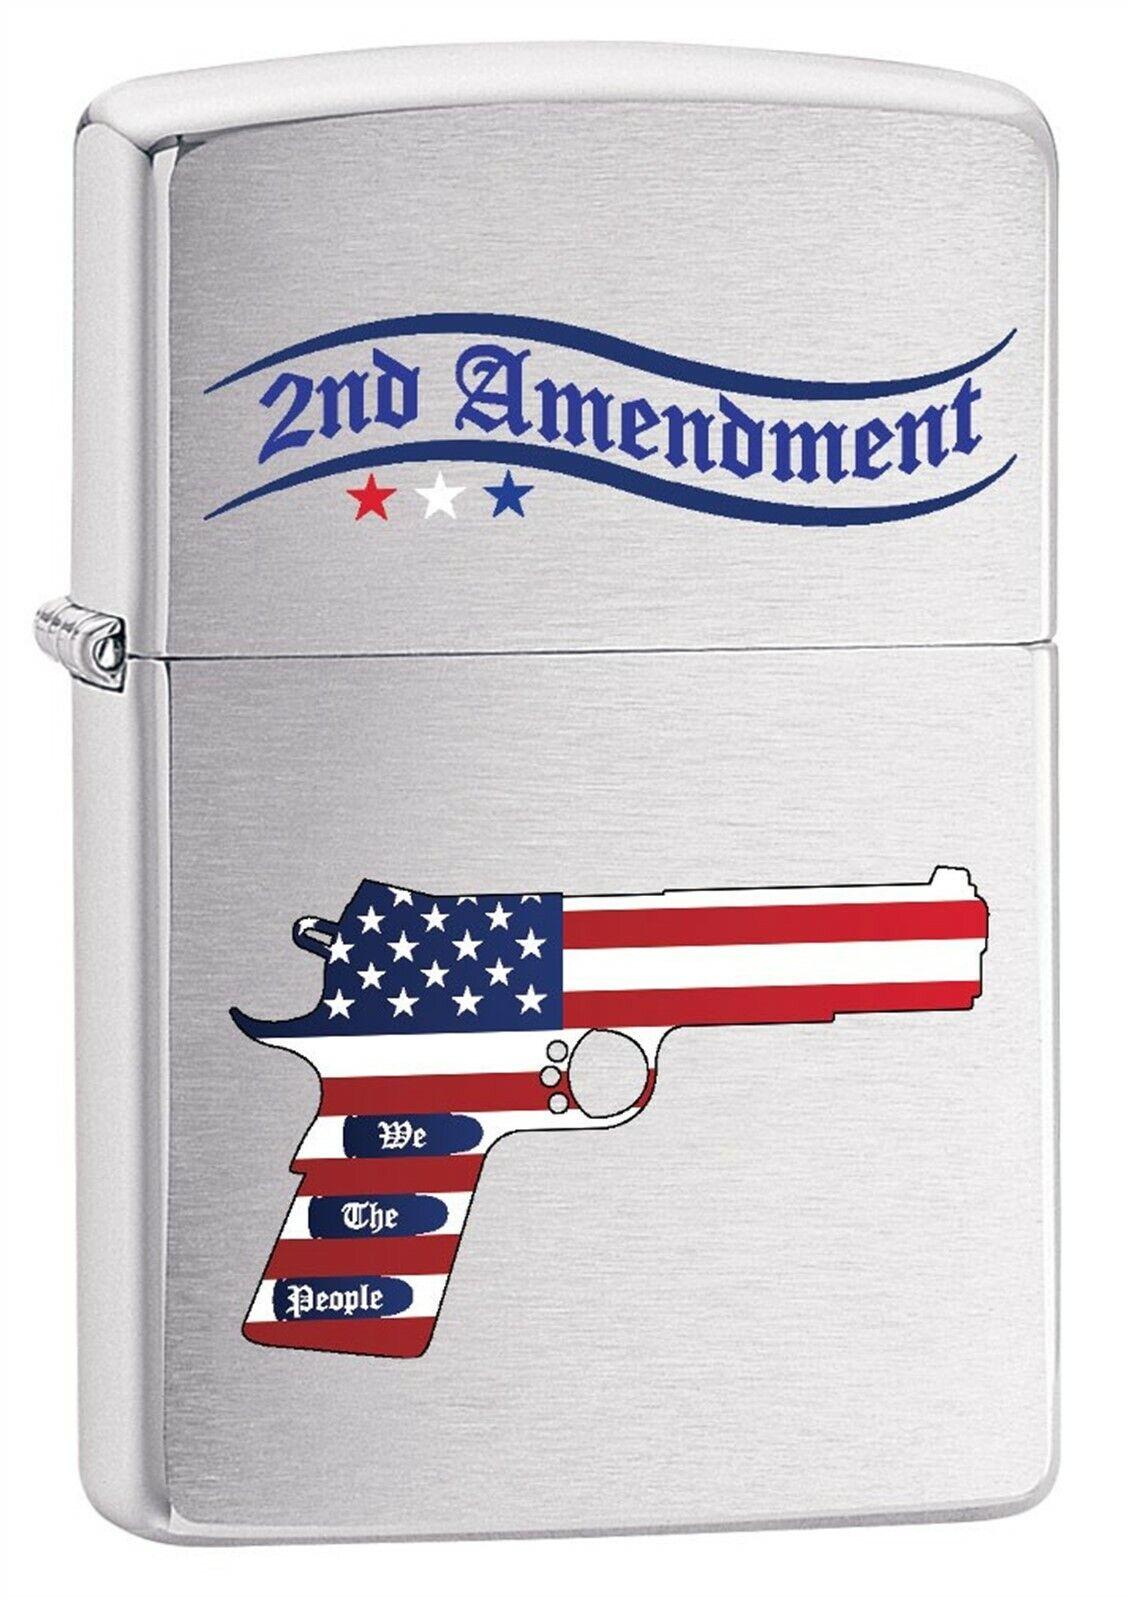 Zippo Lighter: Second Amendment Gun and American Flag - Brus